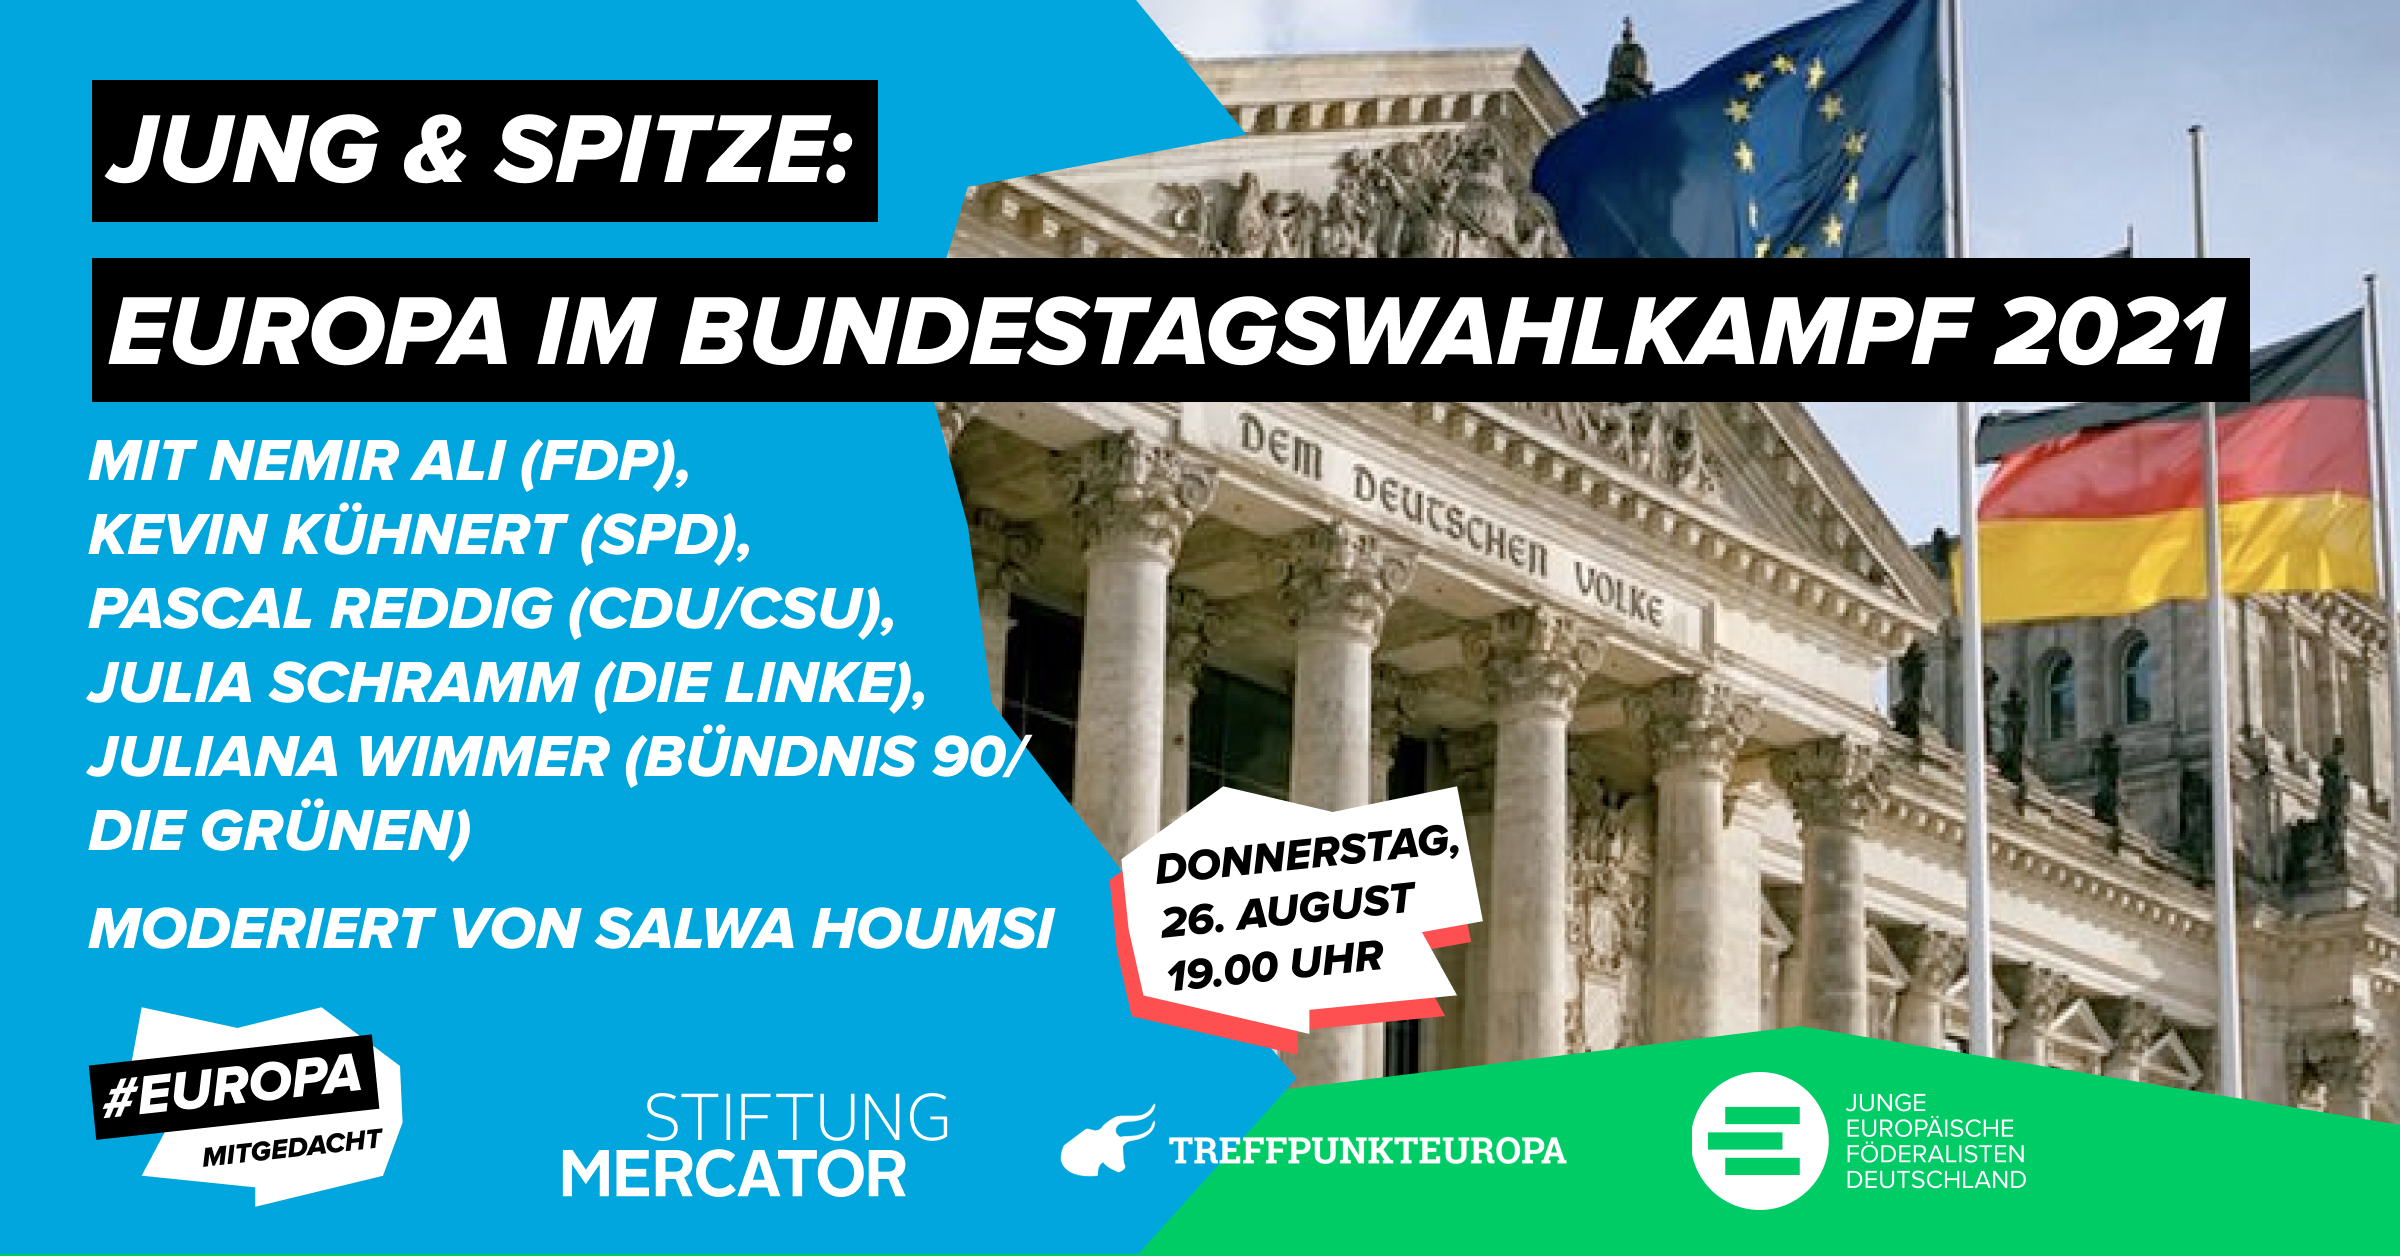 Jung & Spitze 2021: Europa im Bundestagswahlkampf 2021